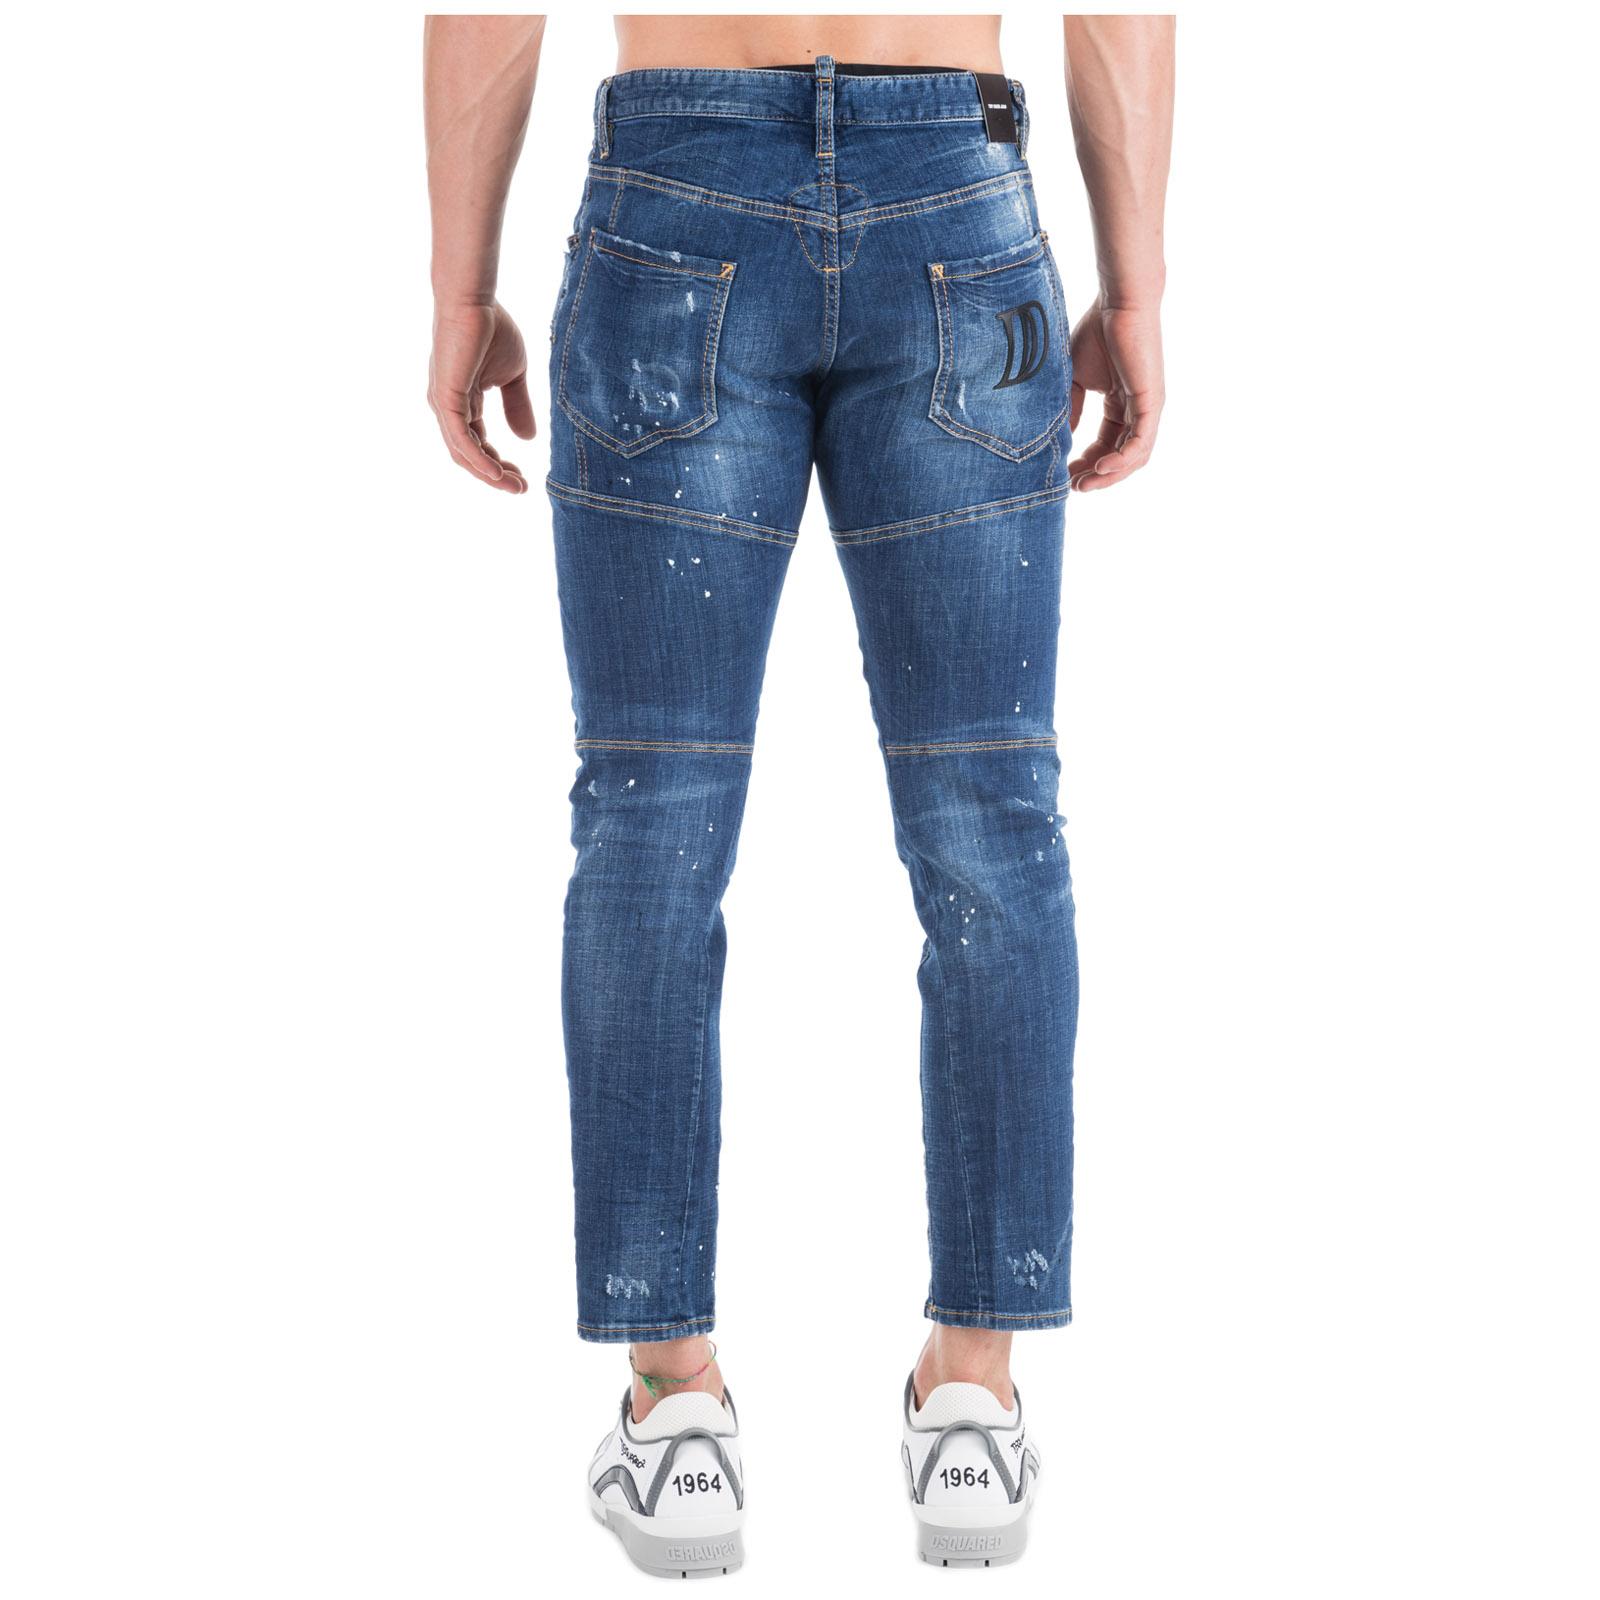 Men's jeans denim tidy biker